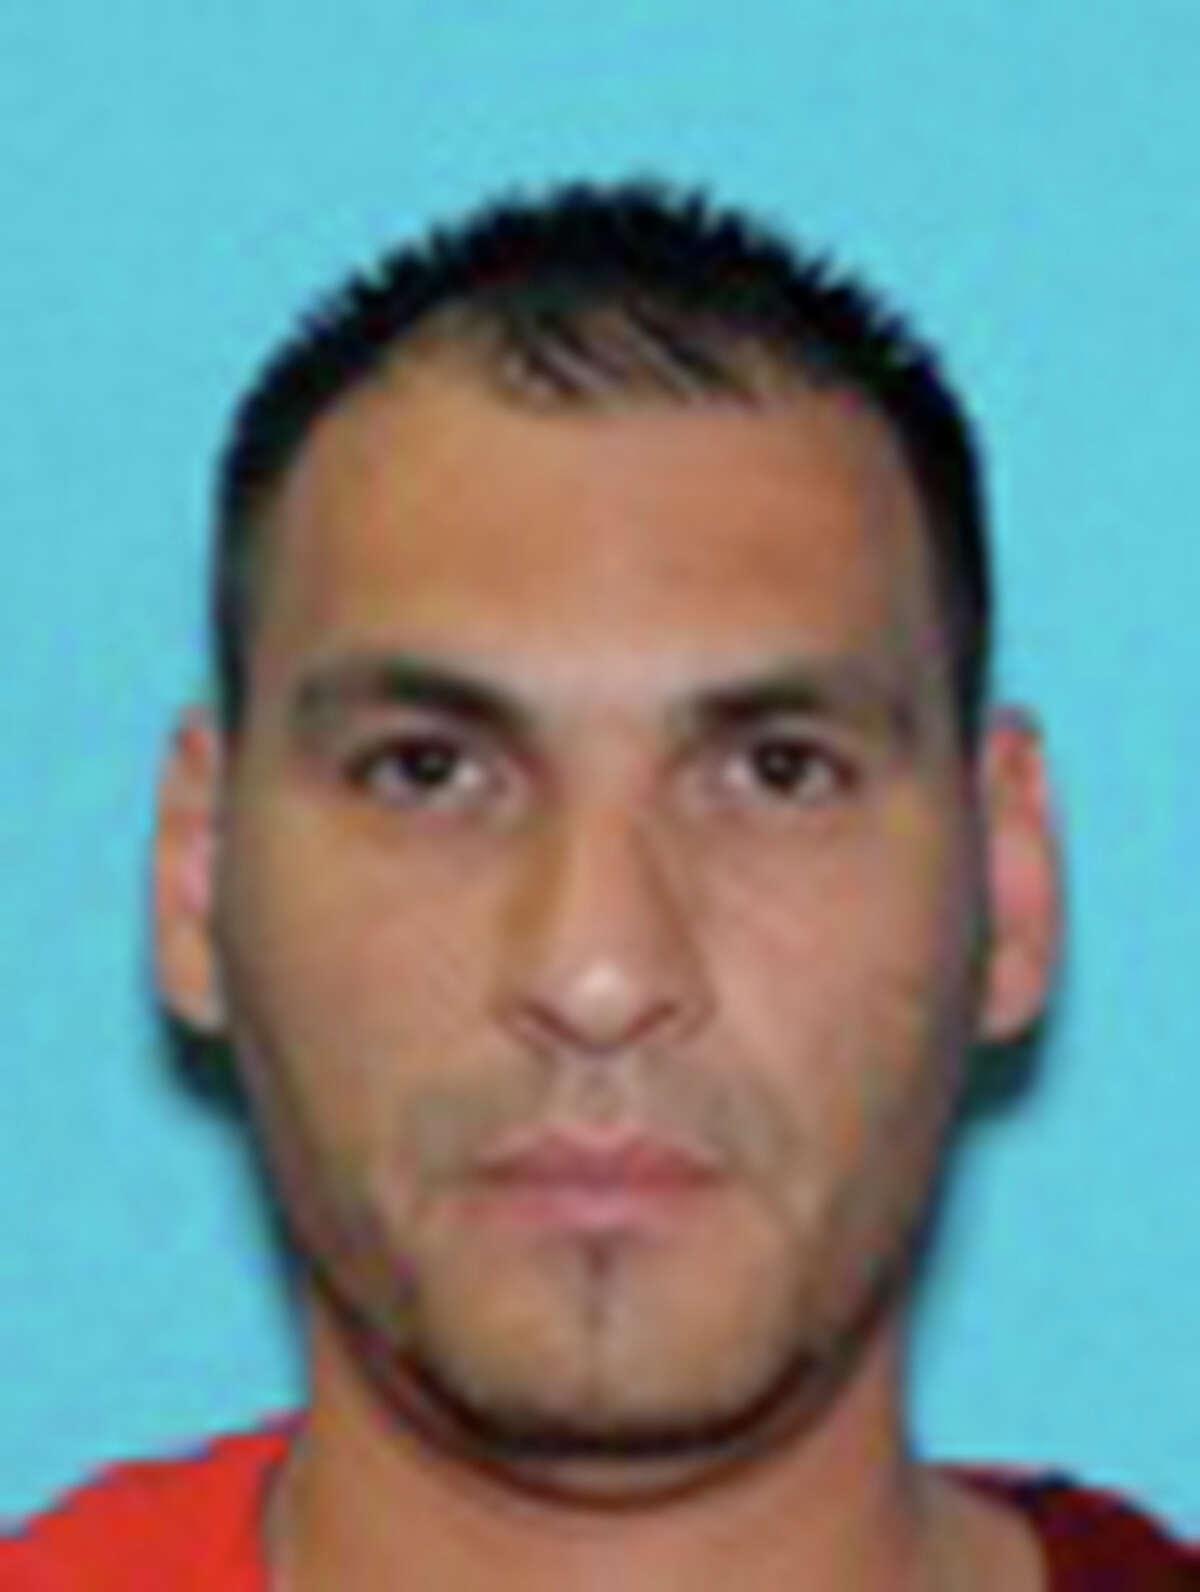 a photo of Jose Antonio Gonzalez, the murder suspect